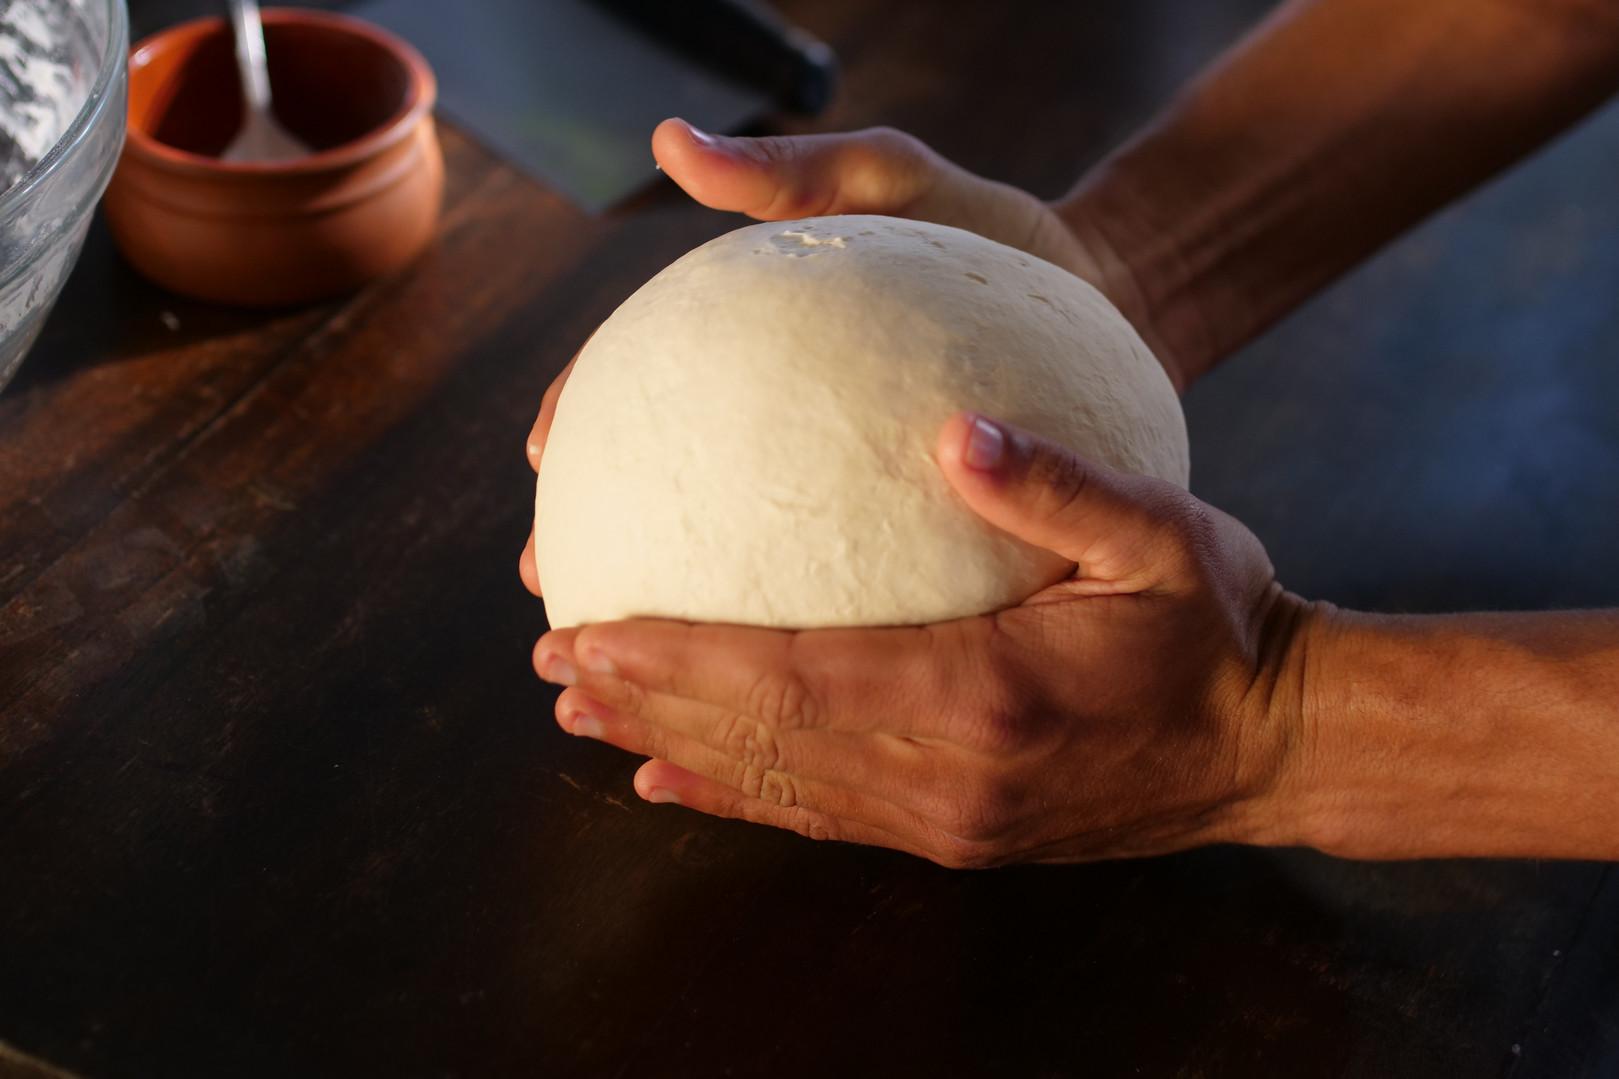 We produce the dough.